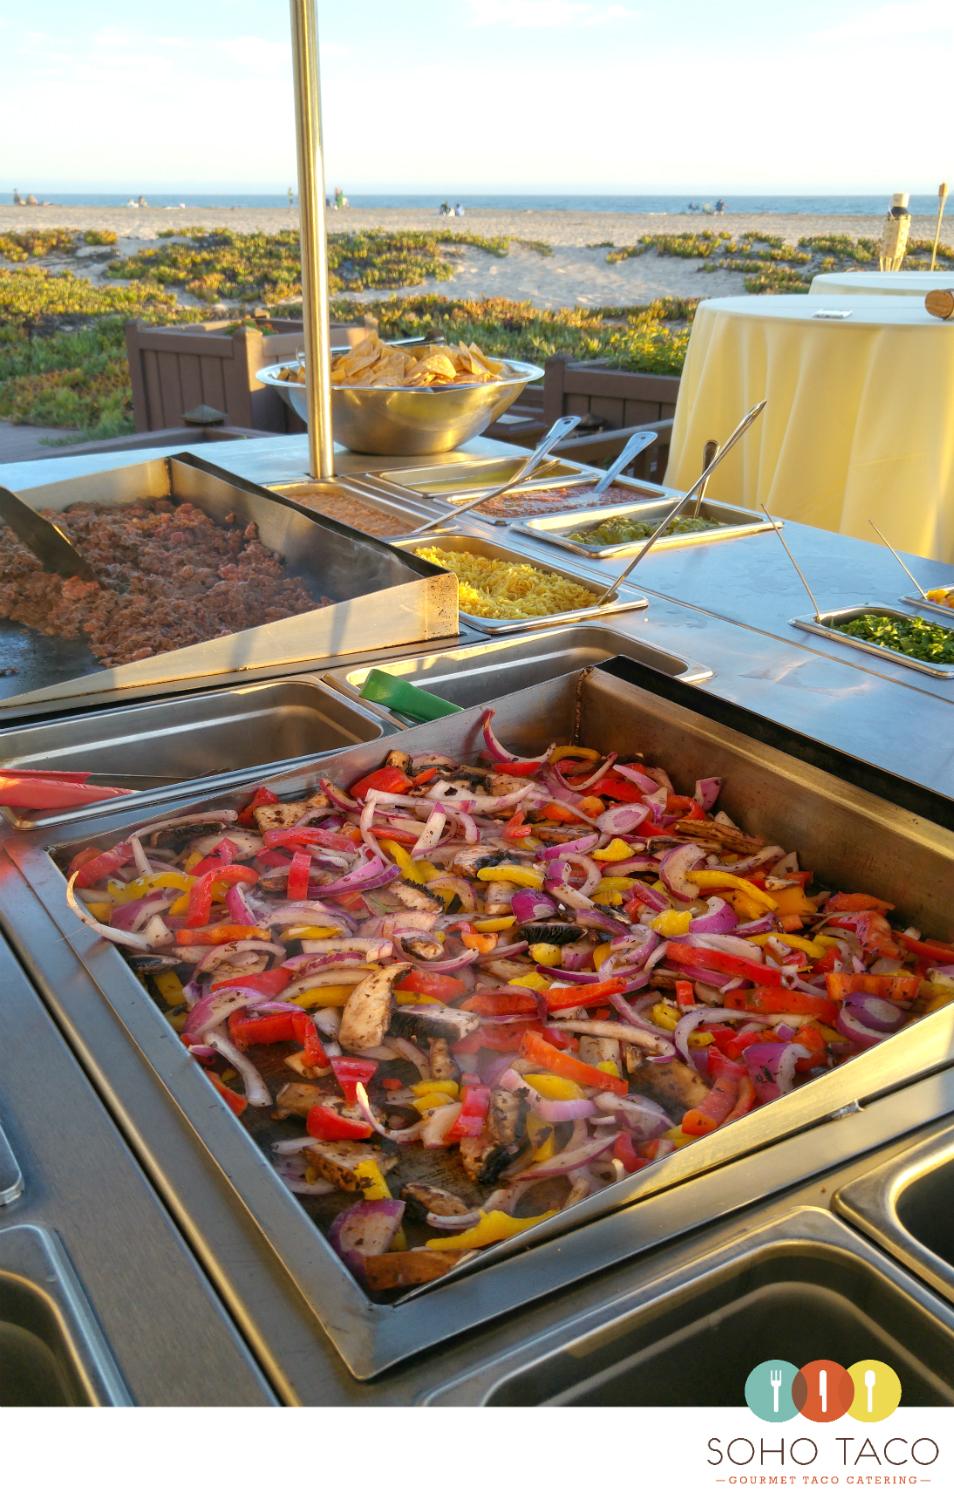 SOHO TACO Gourmet Taco Catering - Wedding - Sunset Beach - Huntington Beach - Orange County - OC